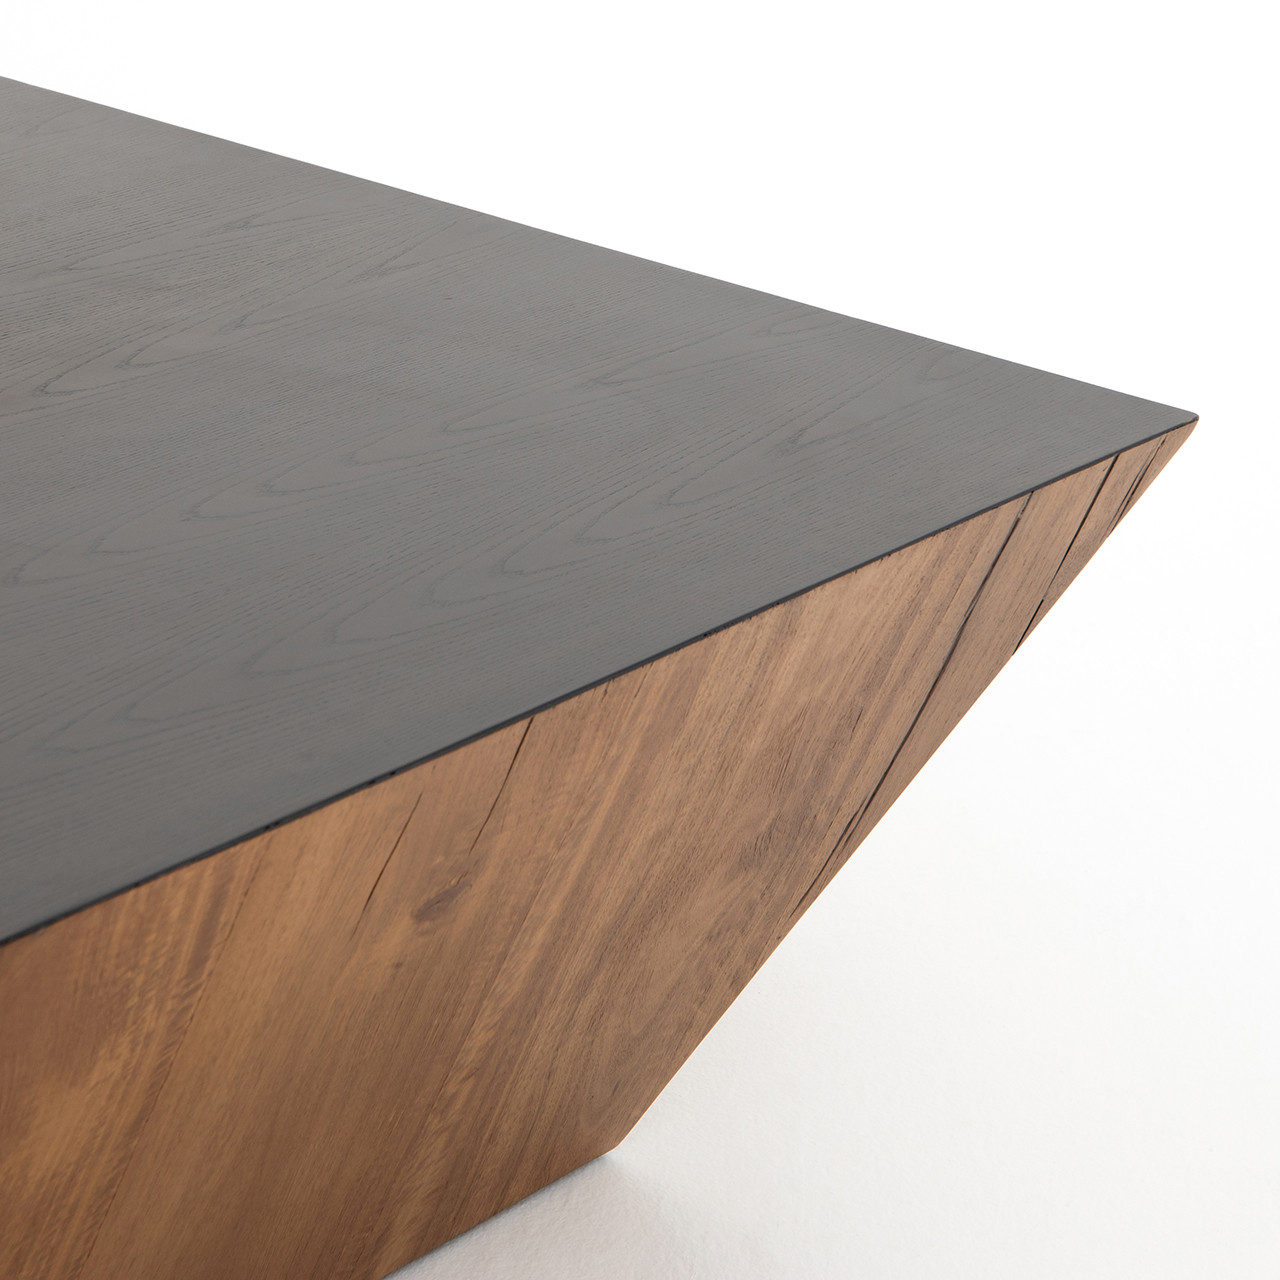 Saxon Coffee Table - Natural Yukas Resin